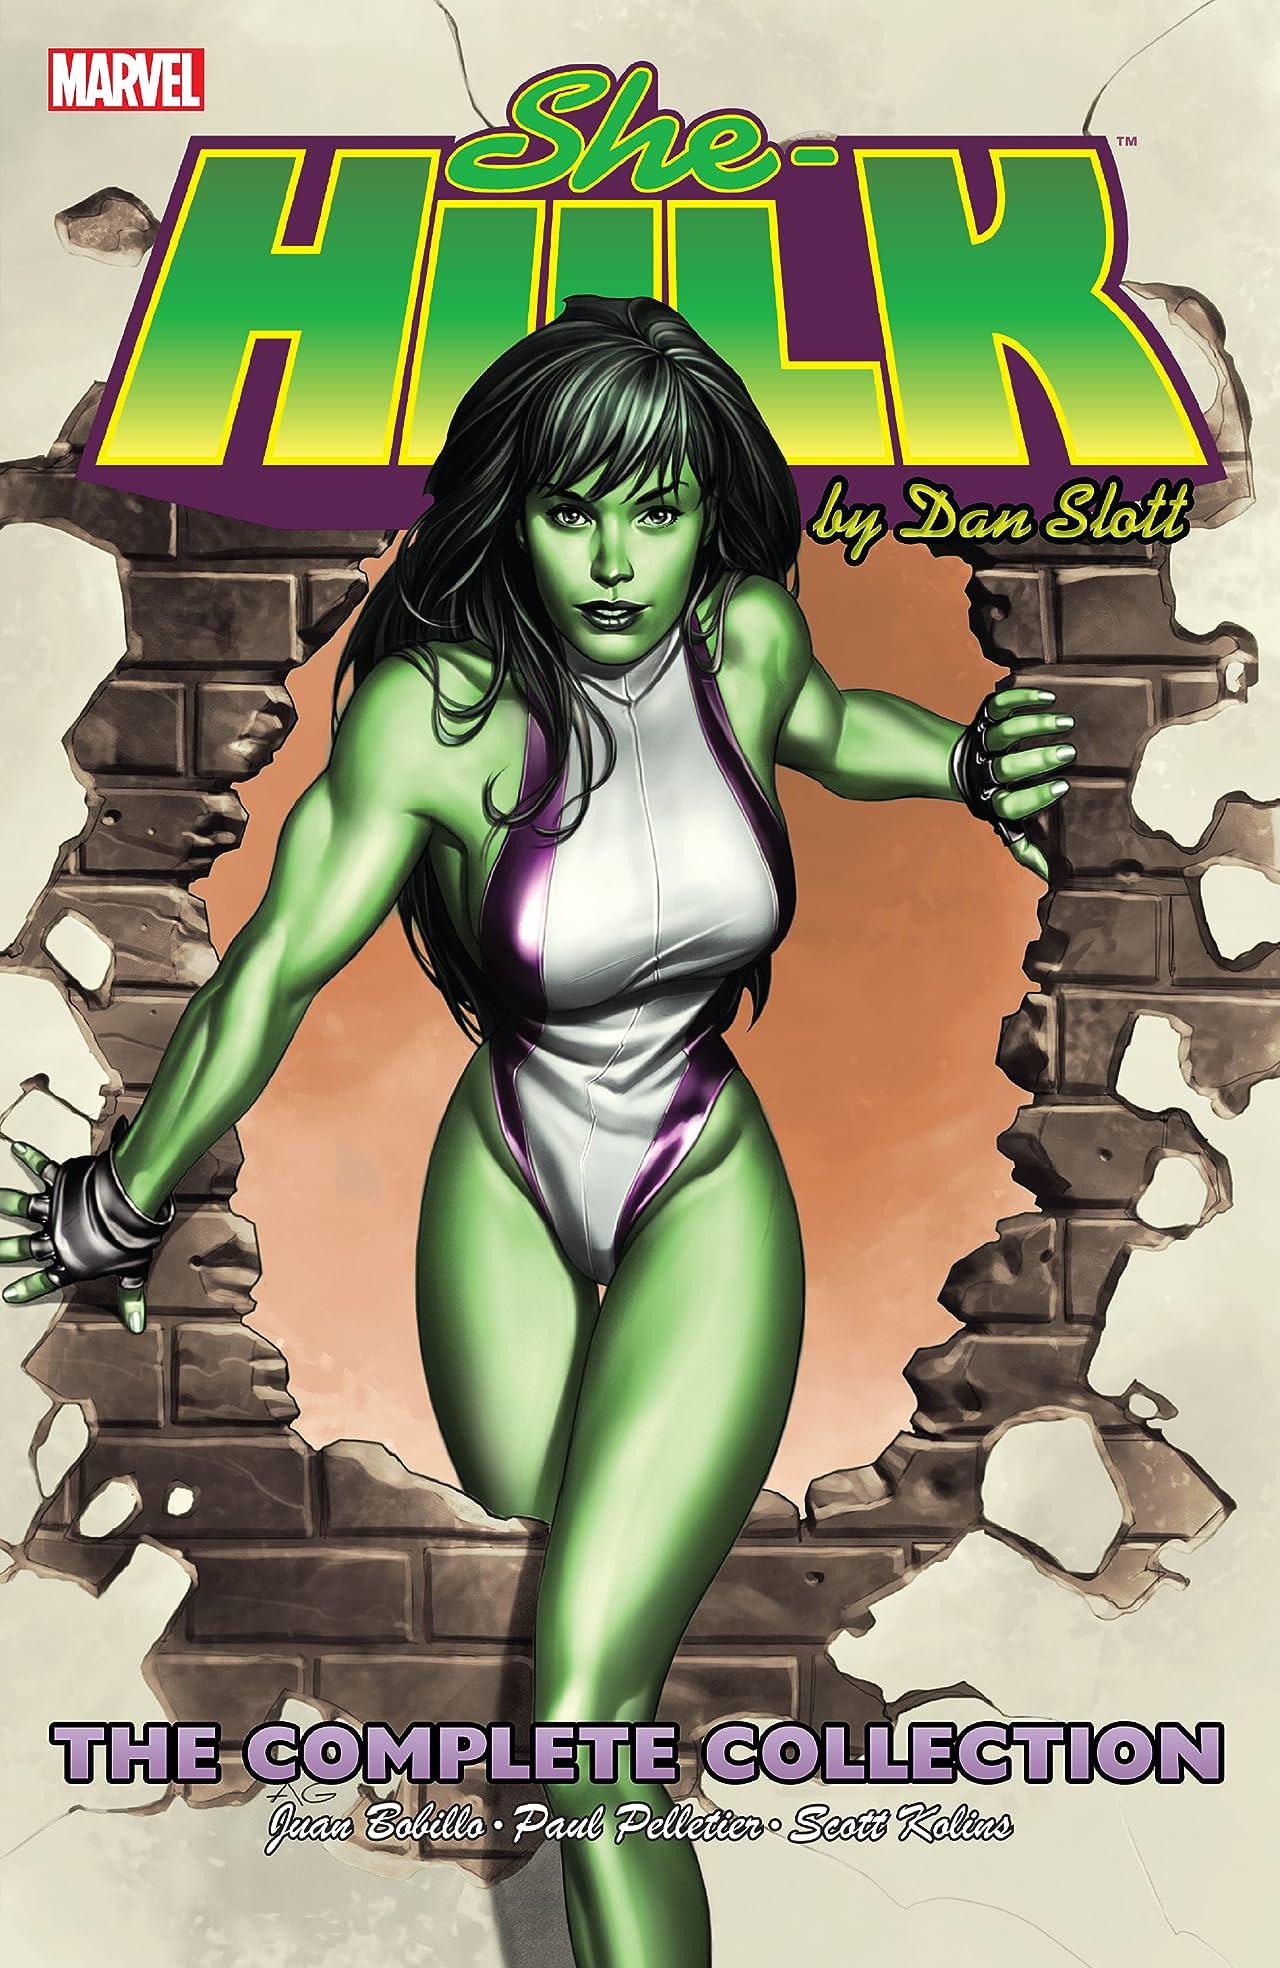 She-Hulk by Dan Slott Complete Collection Vol. 1